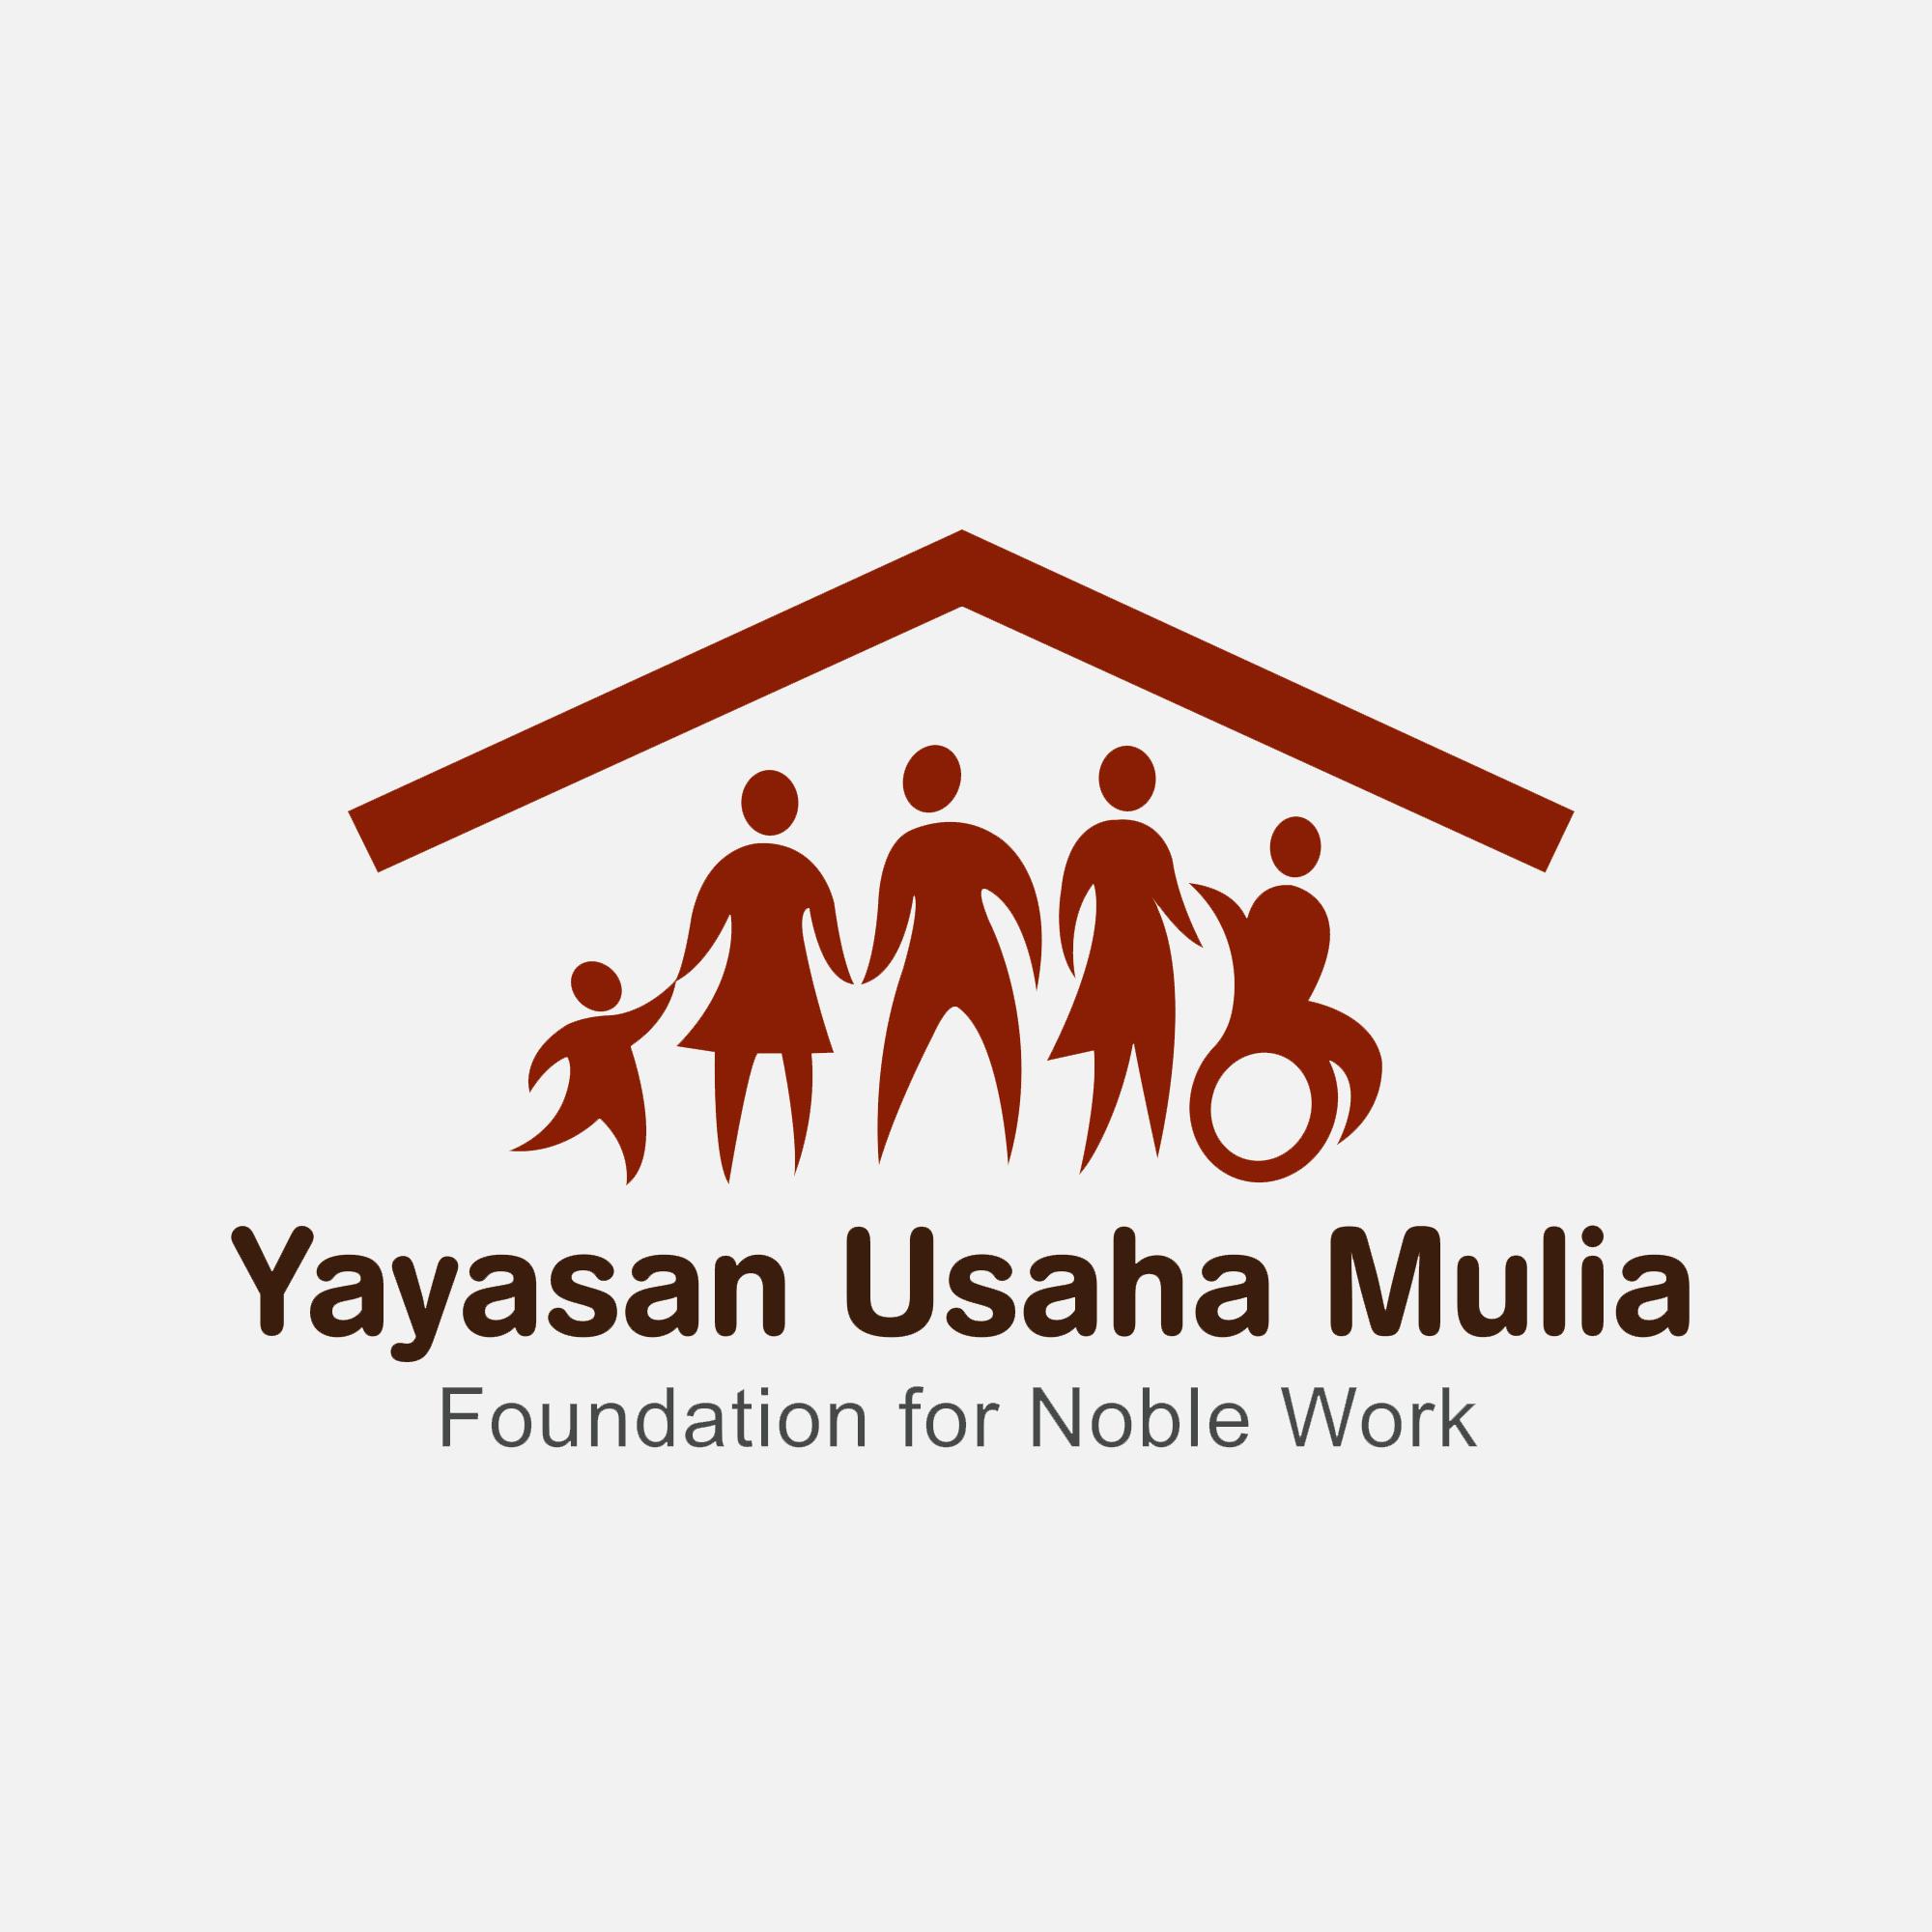 Kemiskinan Harus Dikurangi Dari Sekarang, Semangat Nan Mulia Dari Yayasan Usaha Mulia